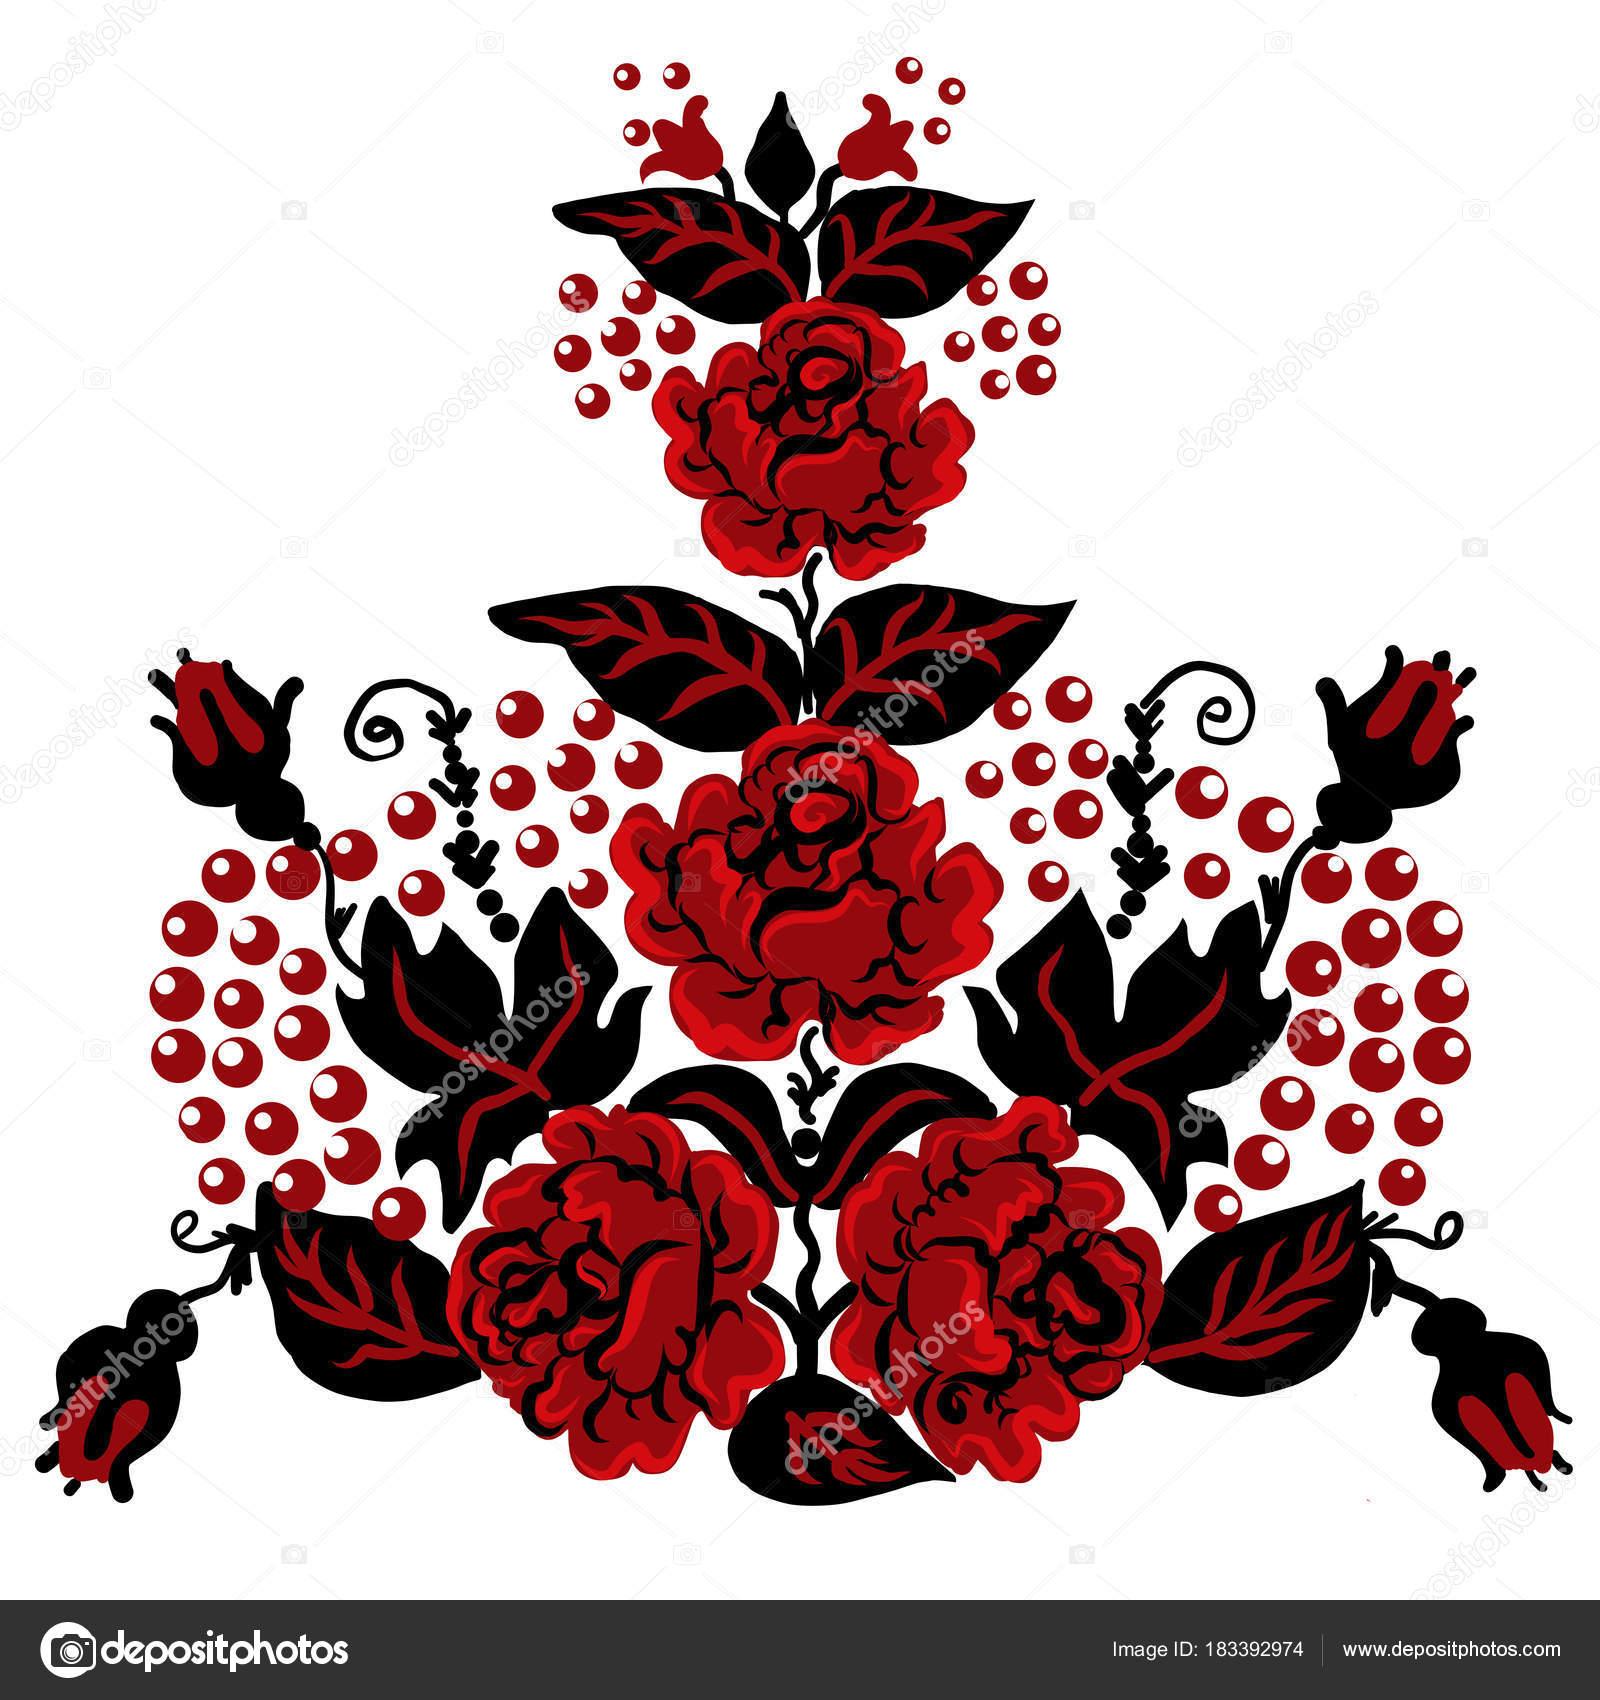 Ukraine Folk Ornament Decoration Design On Cup Clothes Floral Flowers Print For